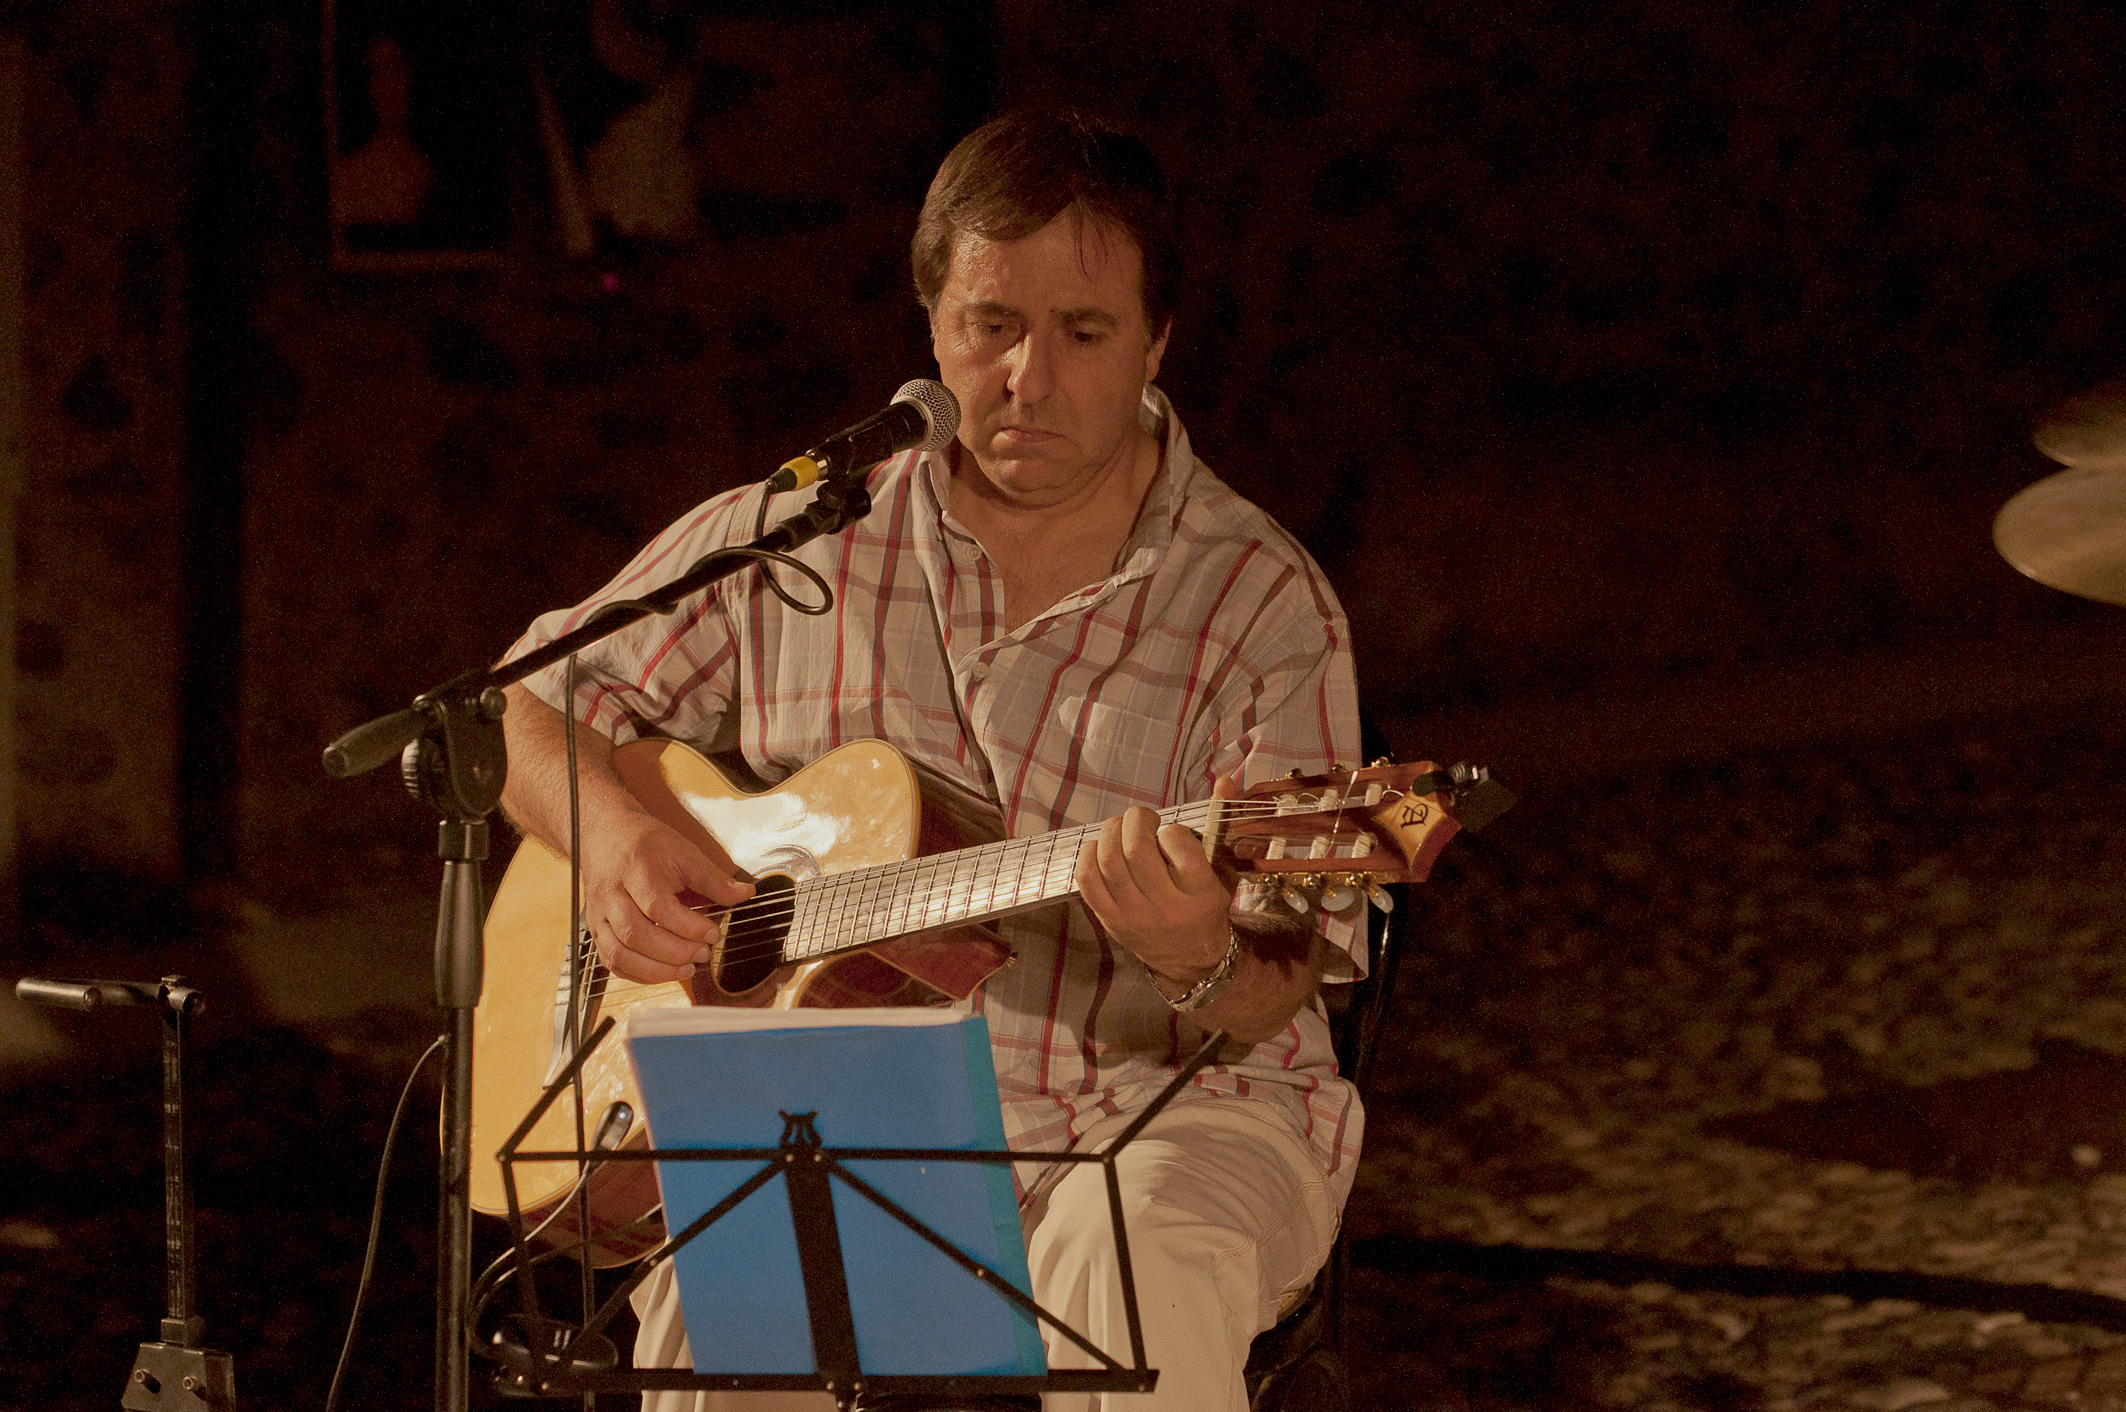 Gustavo Patanchon